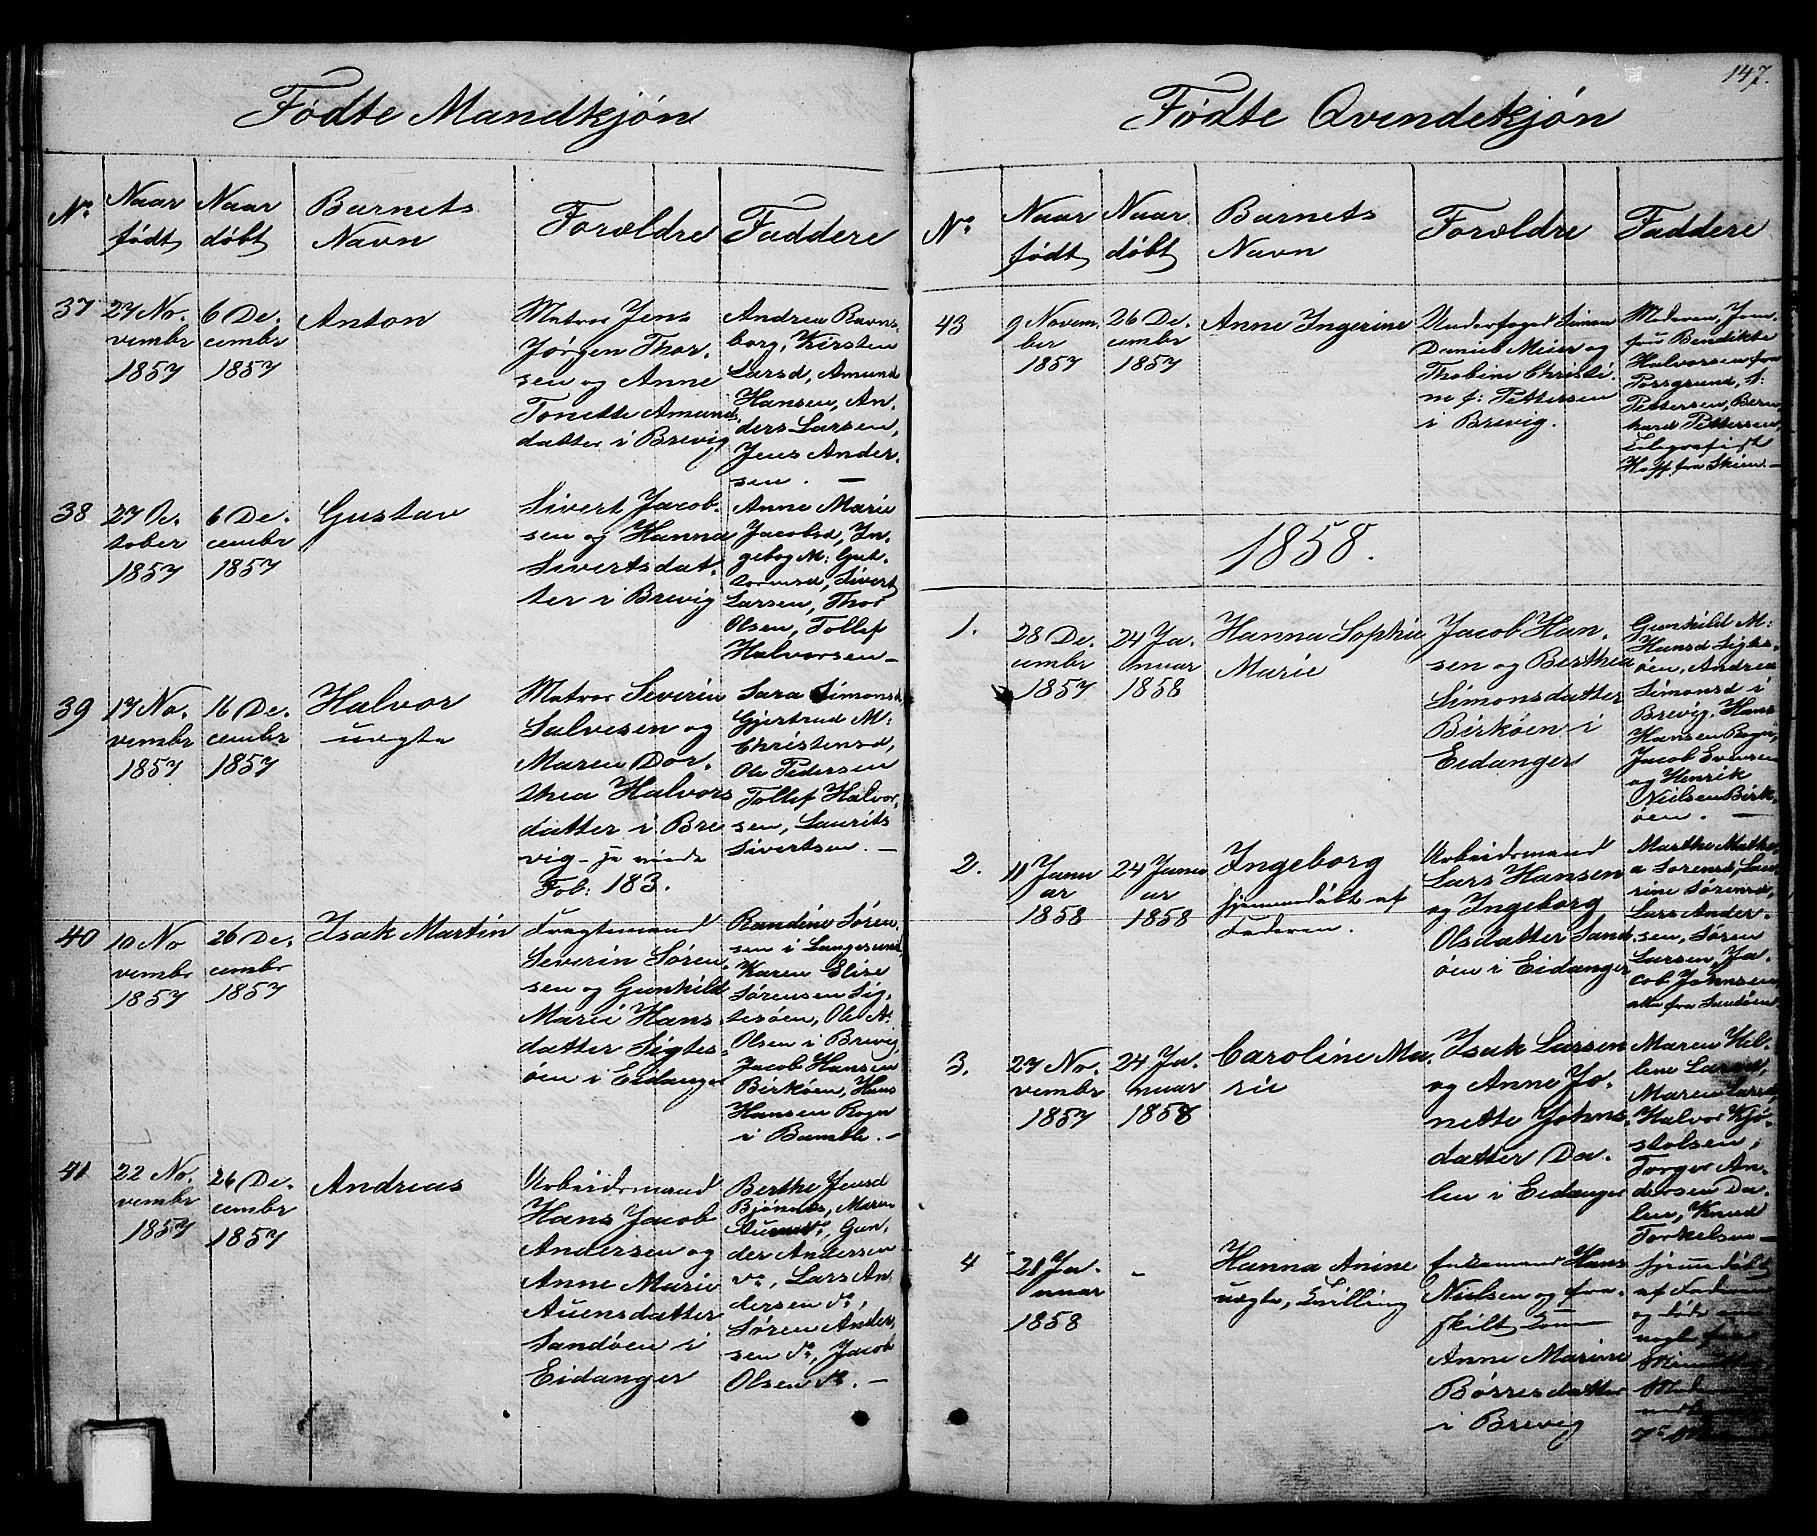 SAKO, Brevik kirkebøker, G/Ga/L0002: Klokkerbok nr. 2, 1846-1865, s. 147